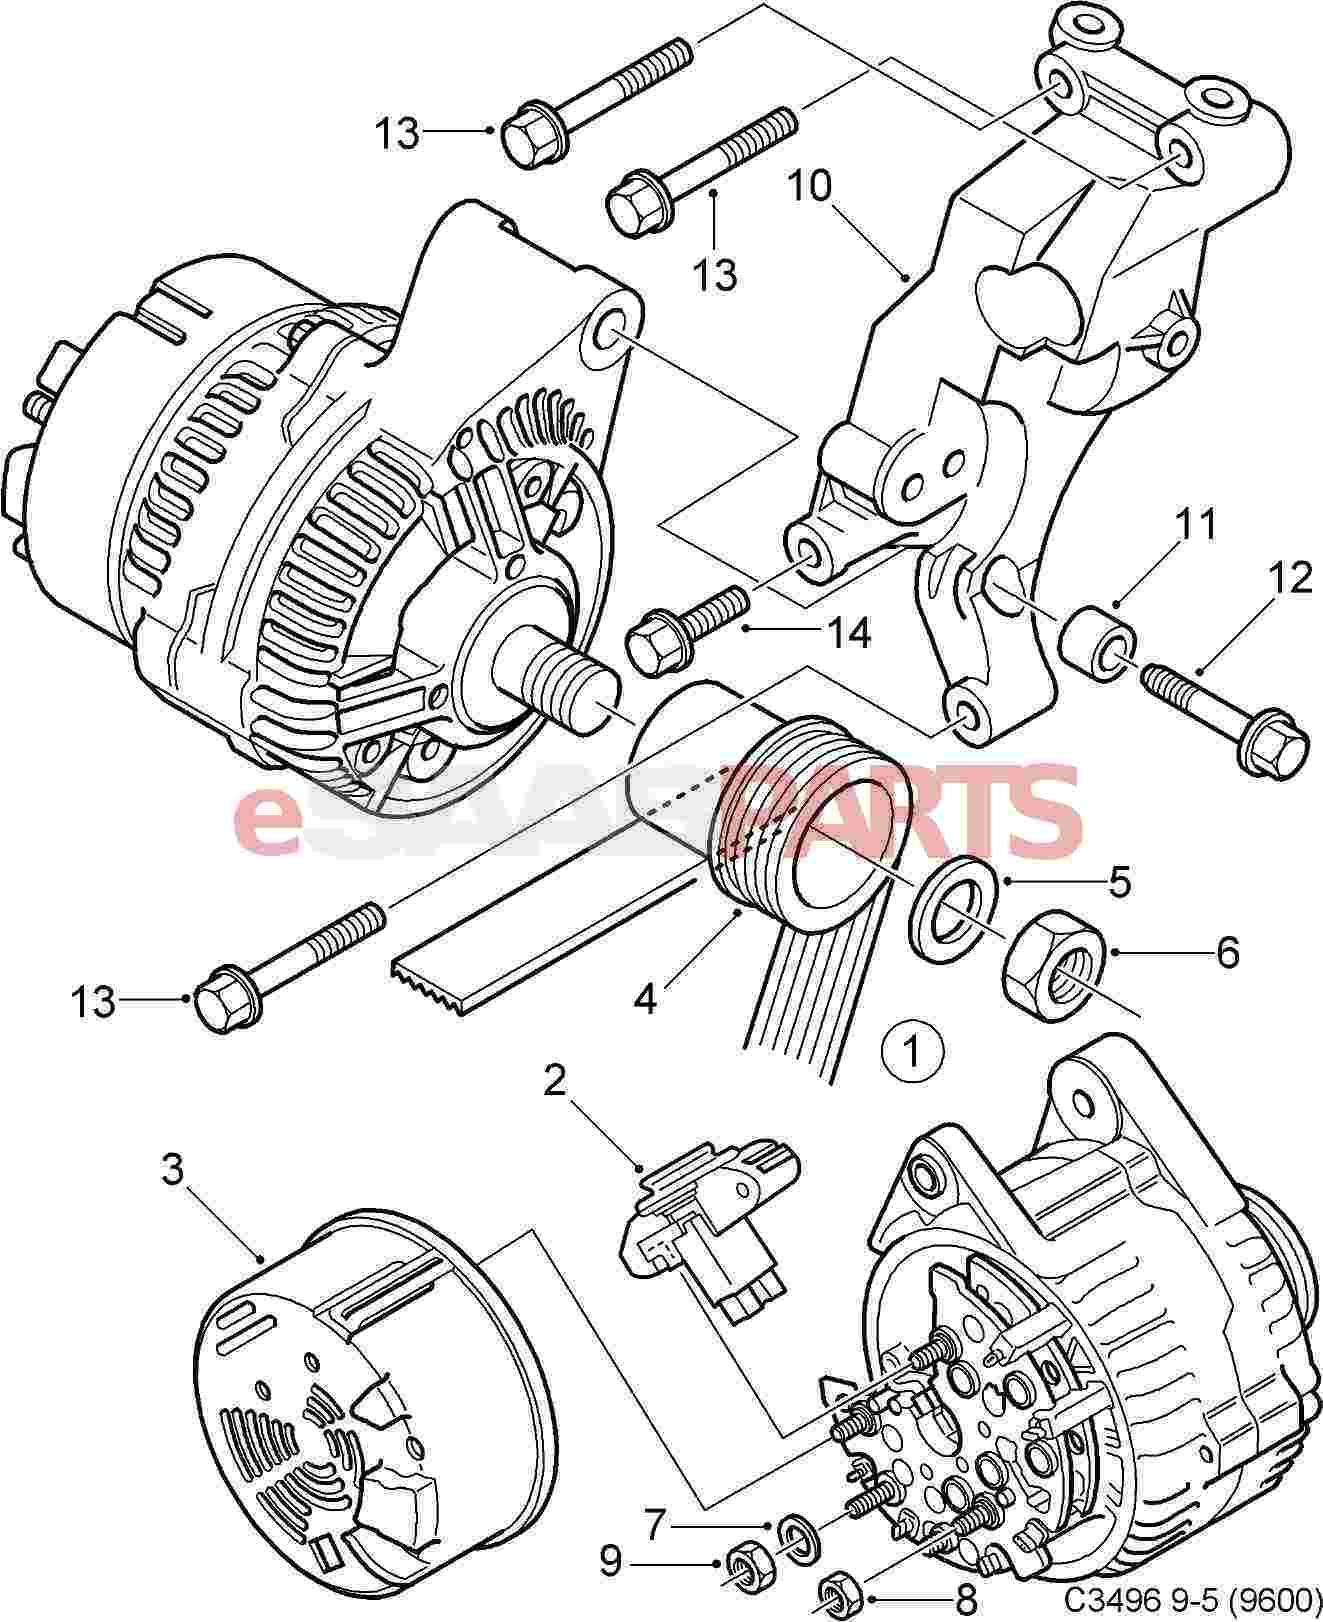 Headlamp Wiring Harness For Saab 9 3 2003